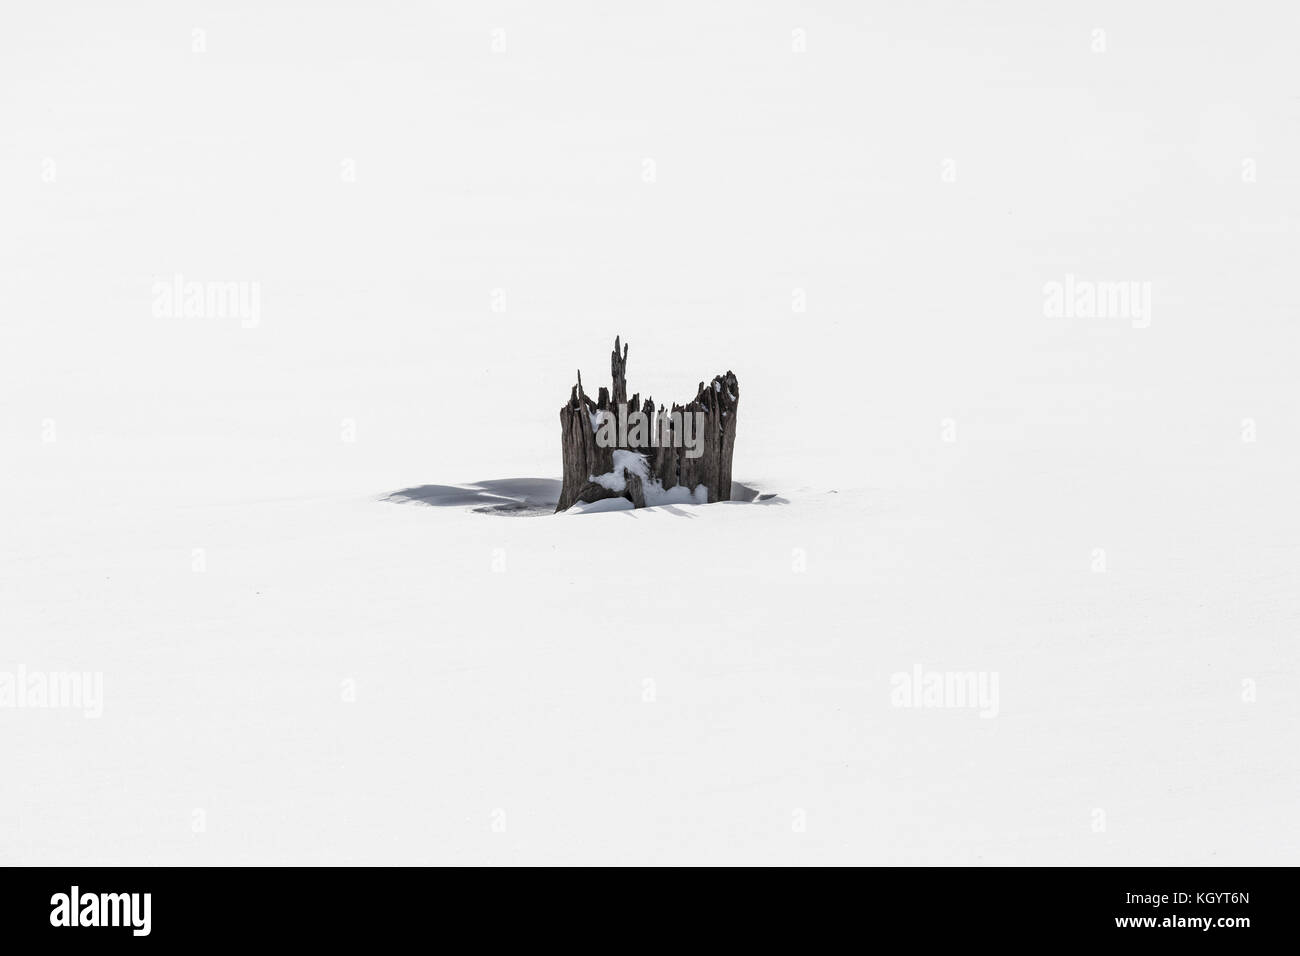 Dead of winter - Stock Image